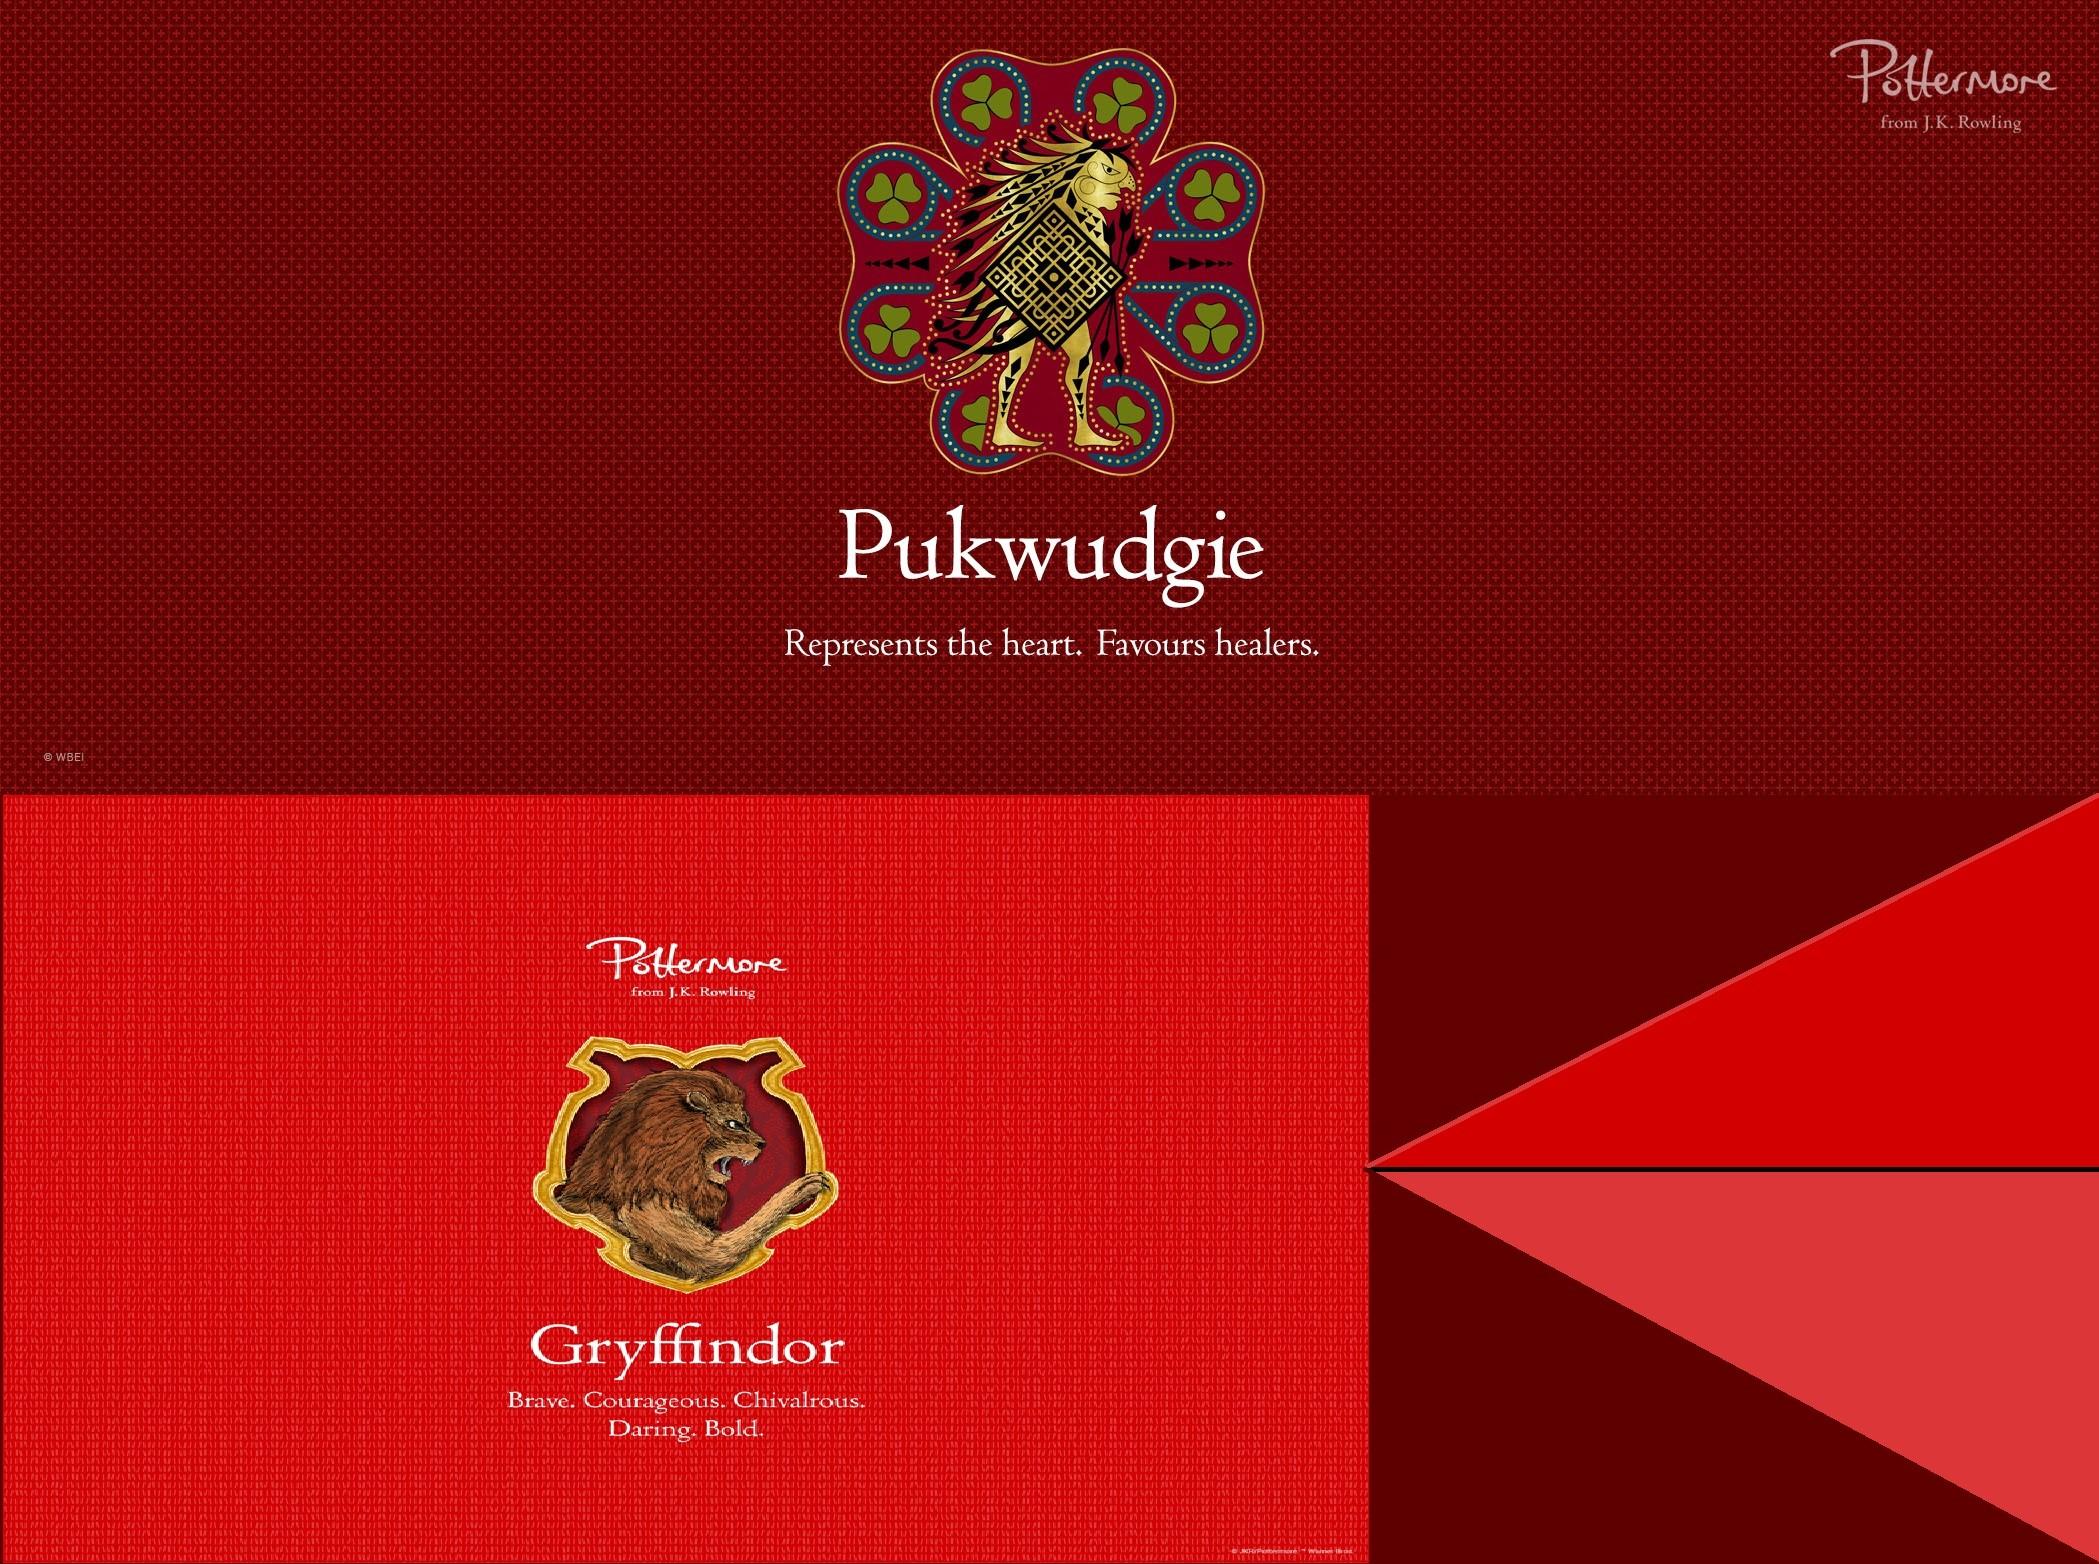 Wallpapers Pukwudgie-Gryffindor by JuniorS89 Wallpapers Pukwudgie-Gryffindor  by JuniorS89